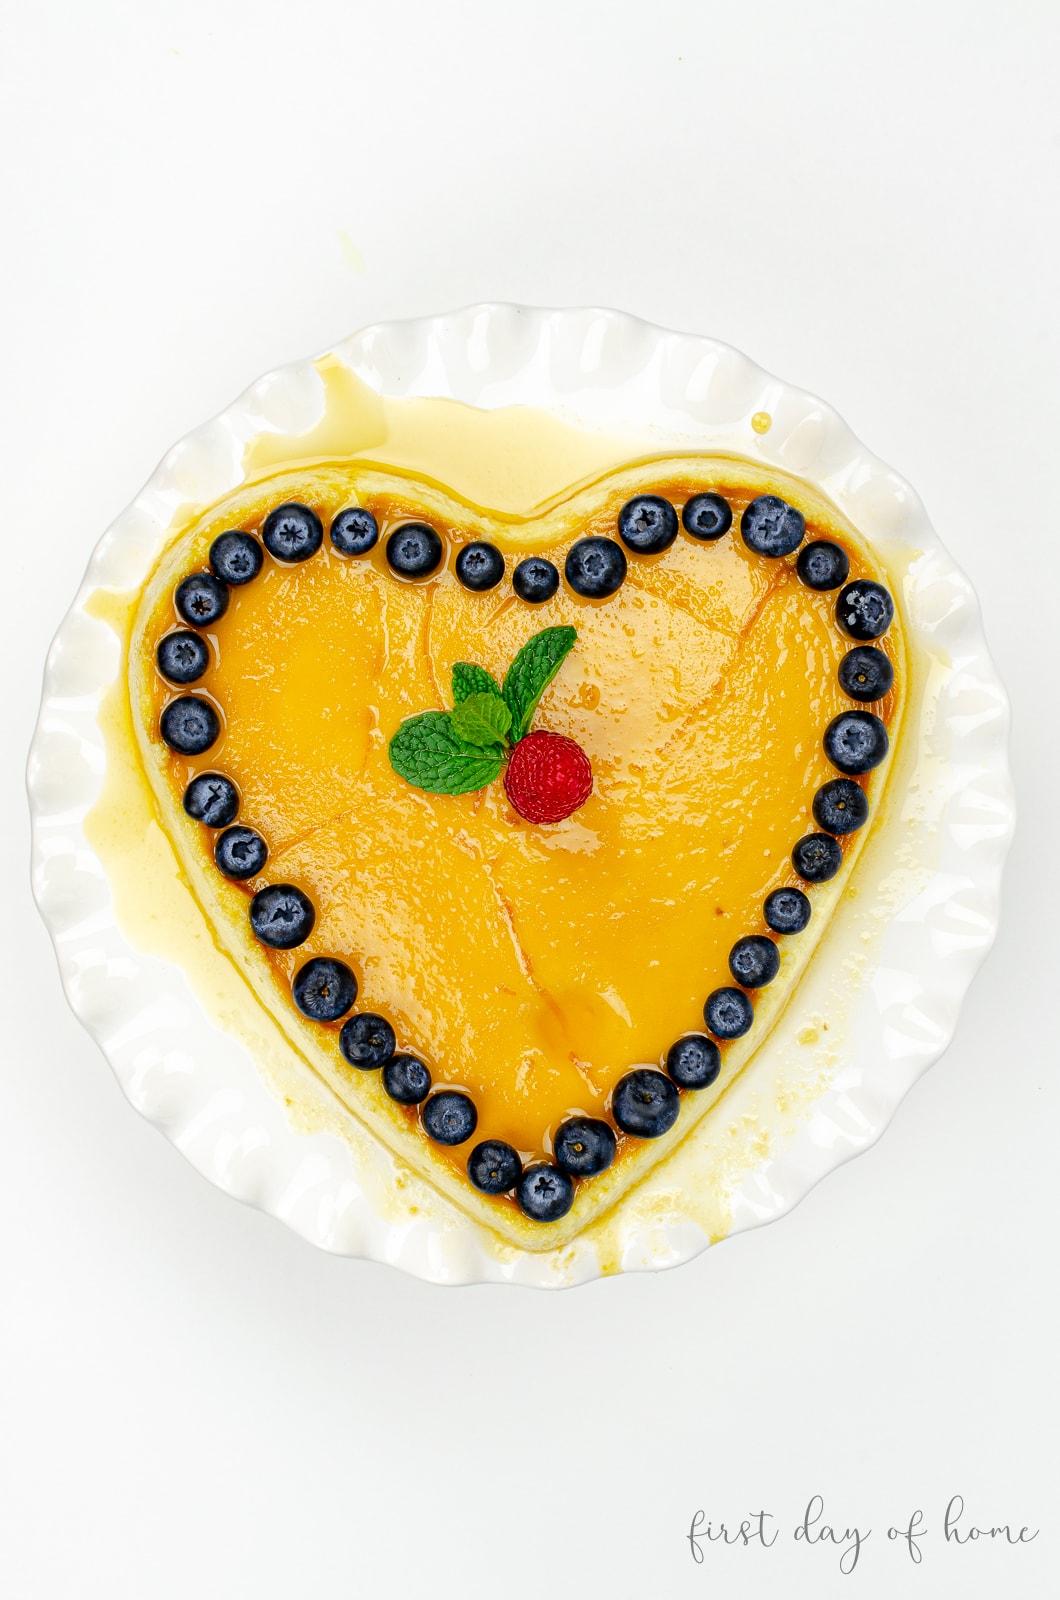 Heart shaped cheesecake flan recipe with blueberries, raspberries and garnish